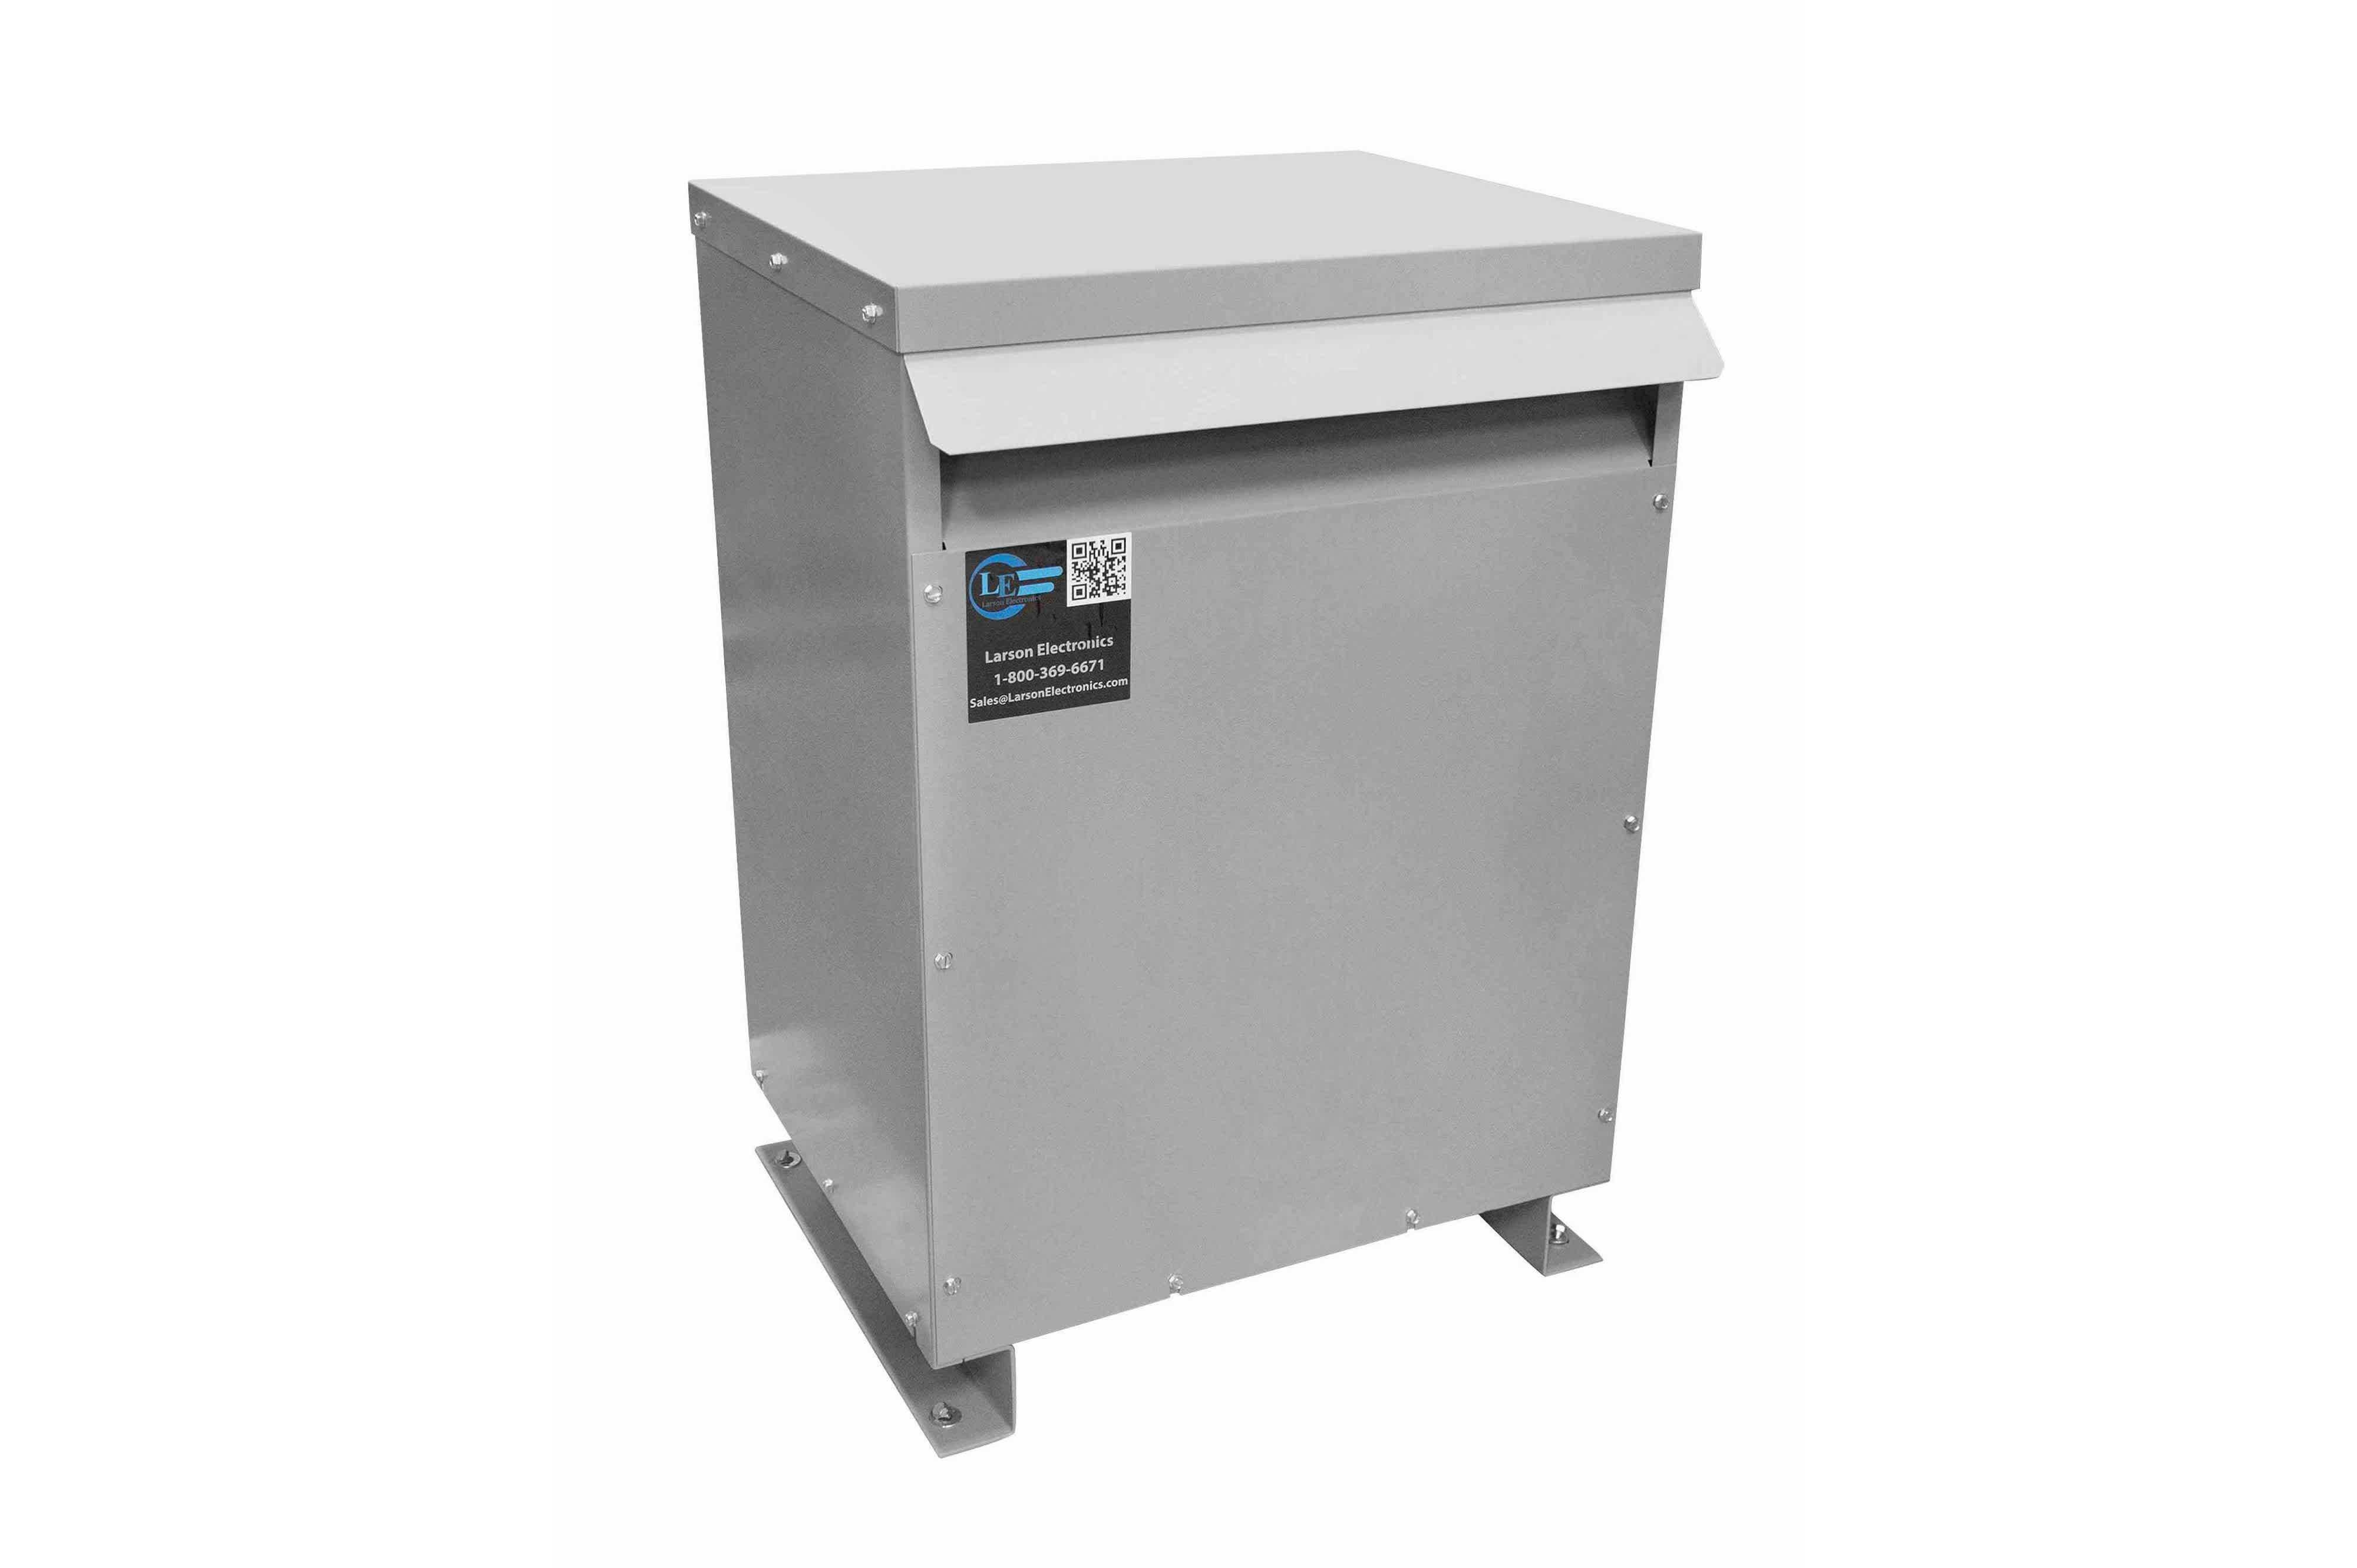 112.5 kVA 3PH Isolation Transformer, 480V Wye Primary, 415Y/240 Wye-N Secondary, N3R, Ventilated, 60 Hz